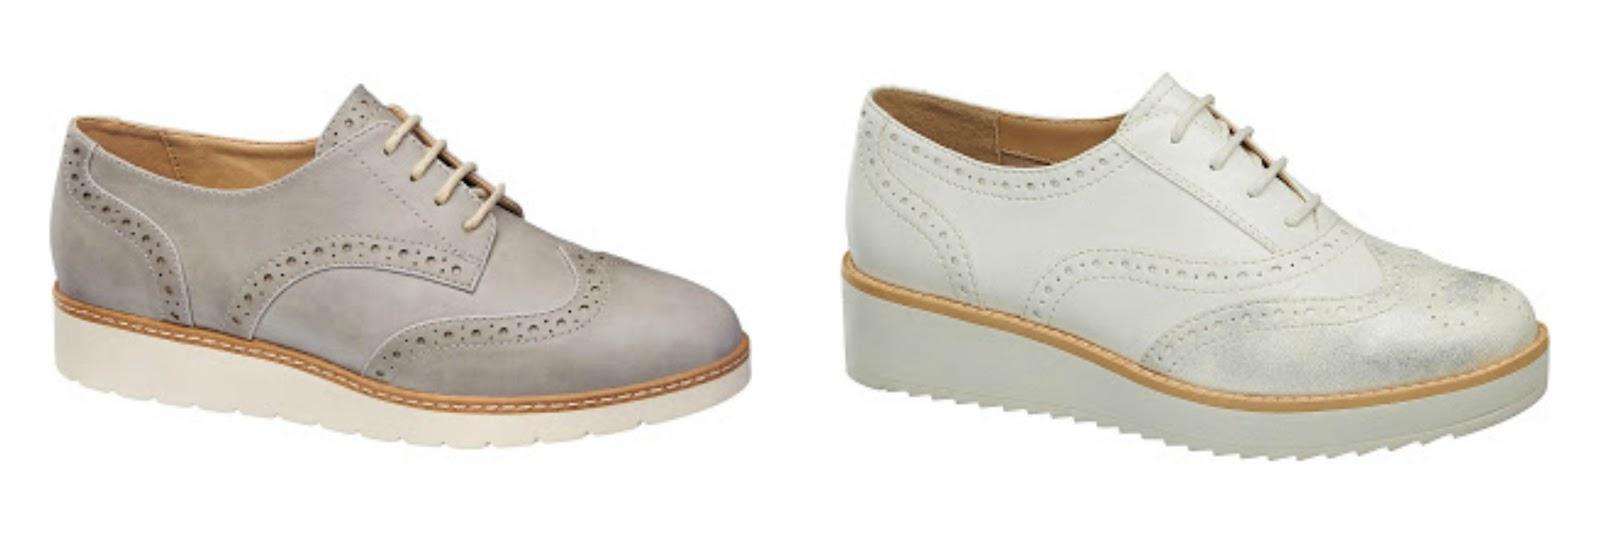 Trendy friends  Deichmann  Porque nos encantan los zapatos d4737166d3d